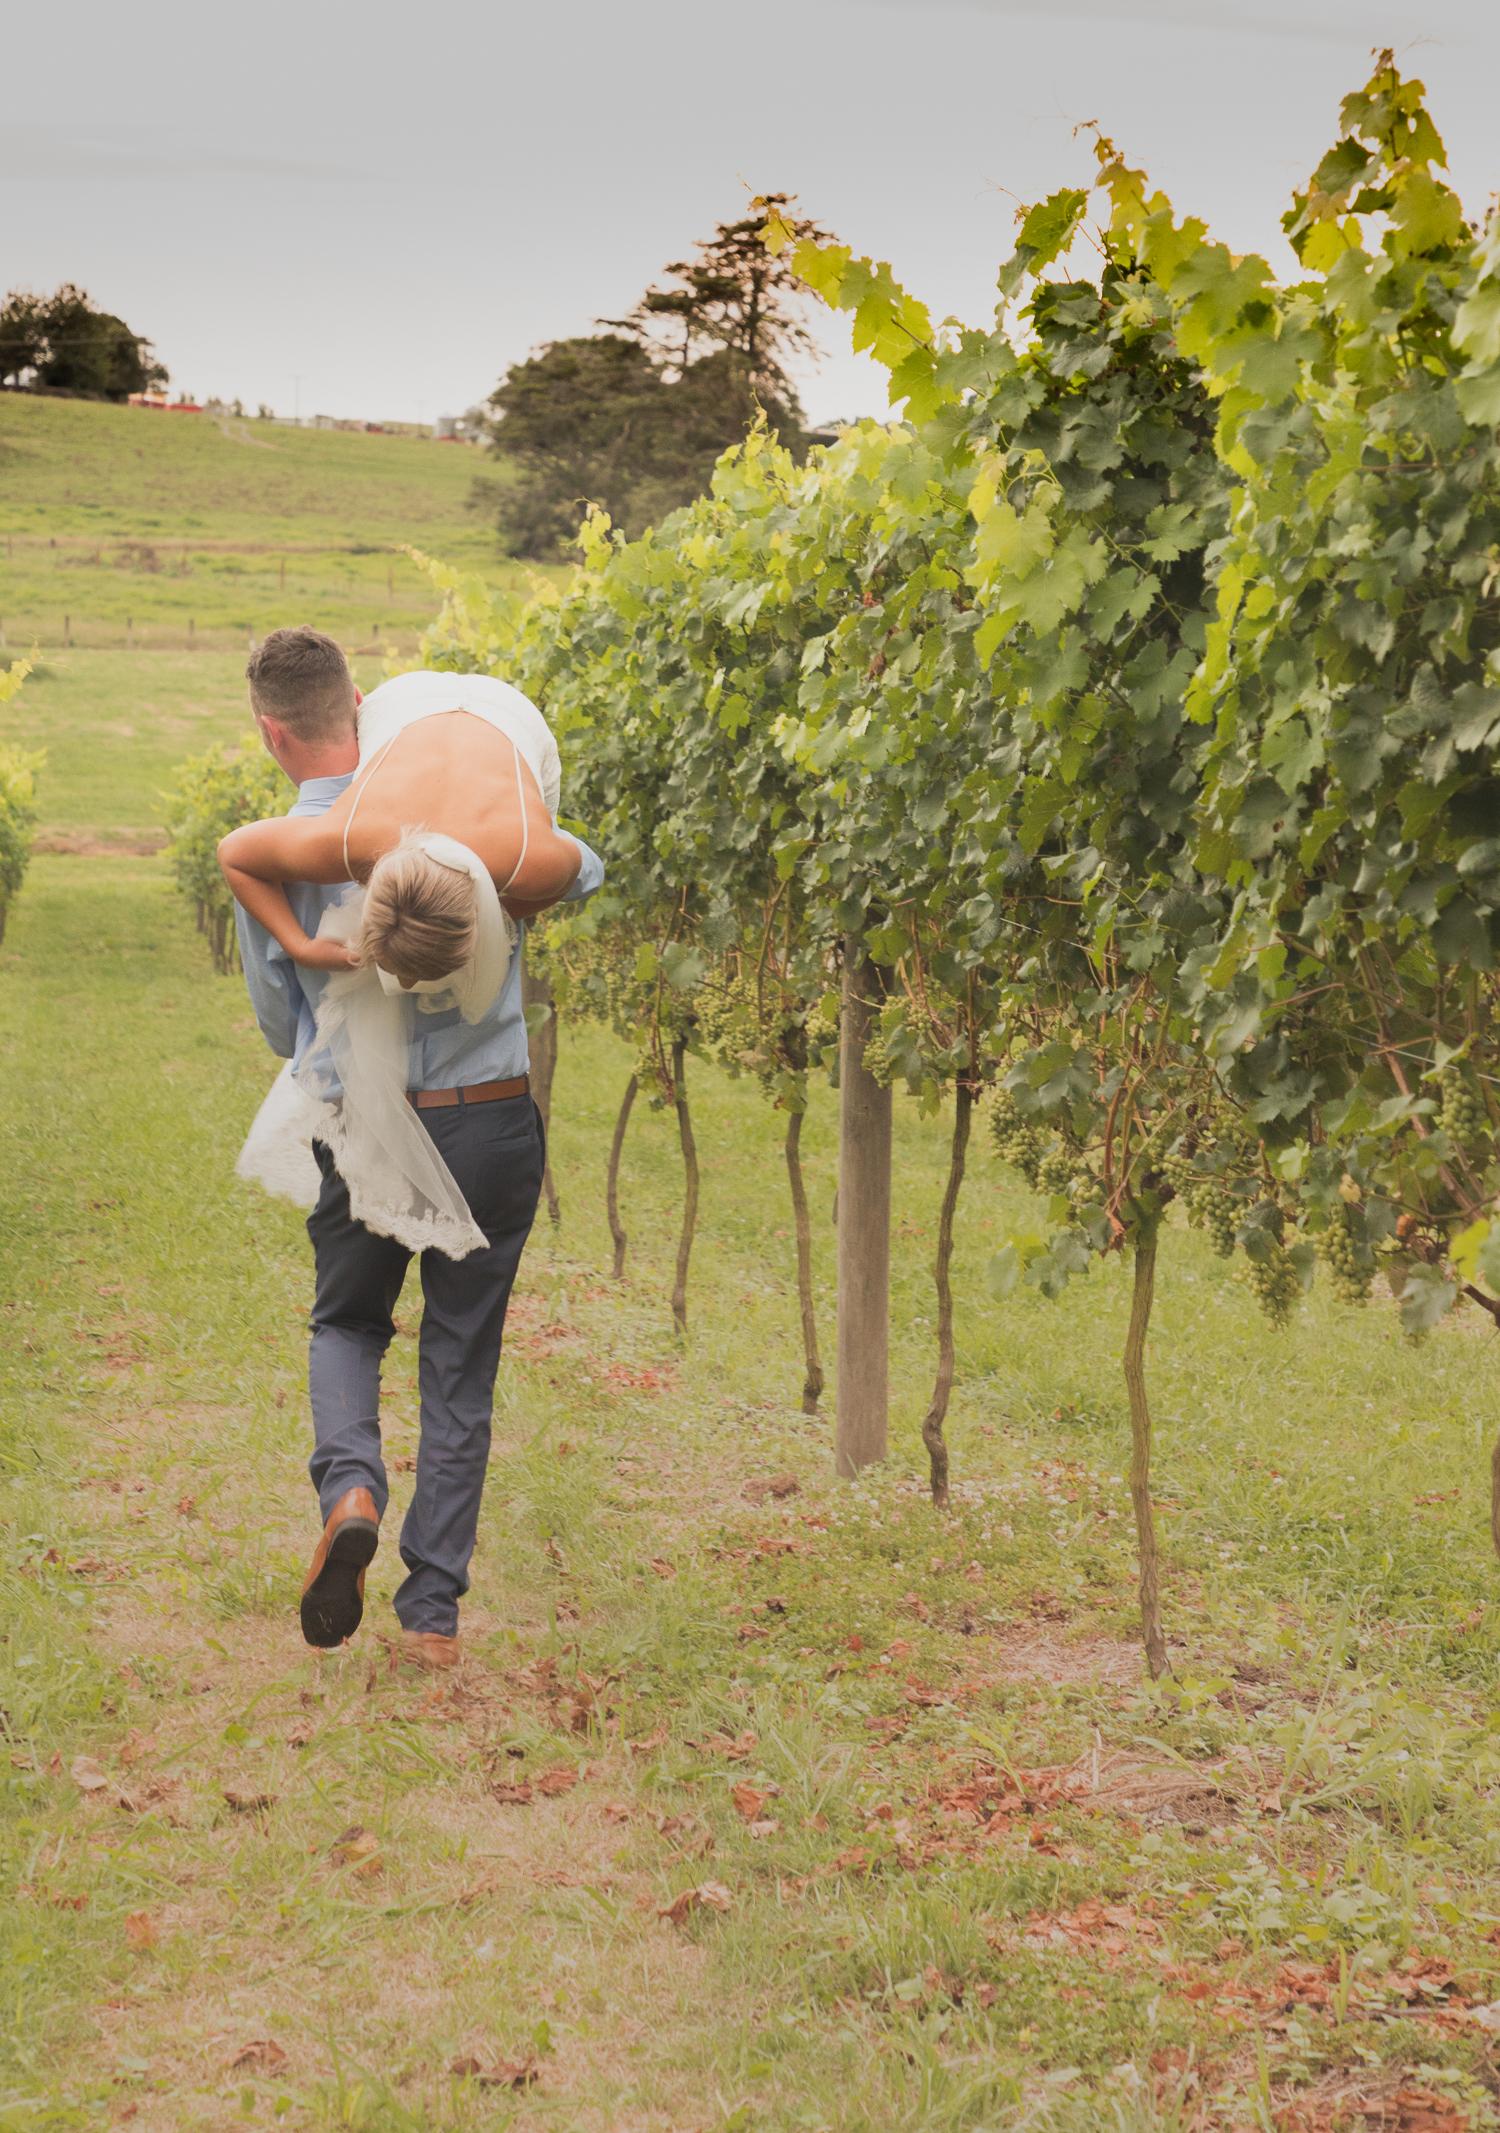 groom carrying bride on wedding day